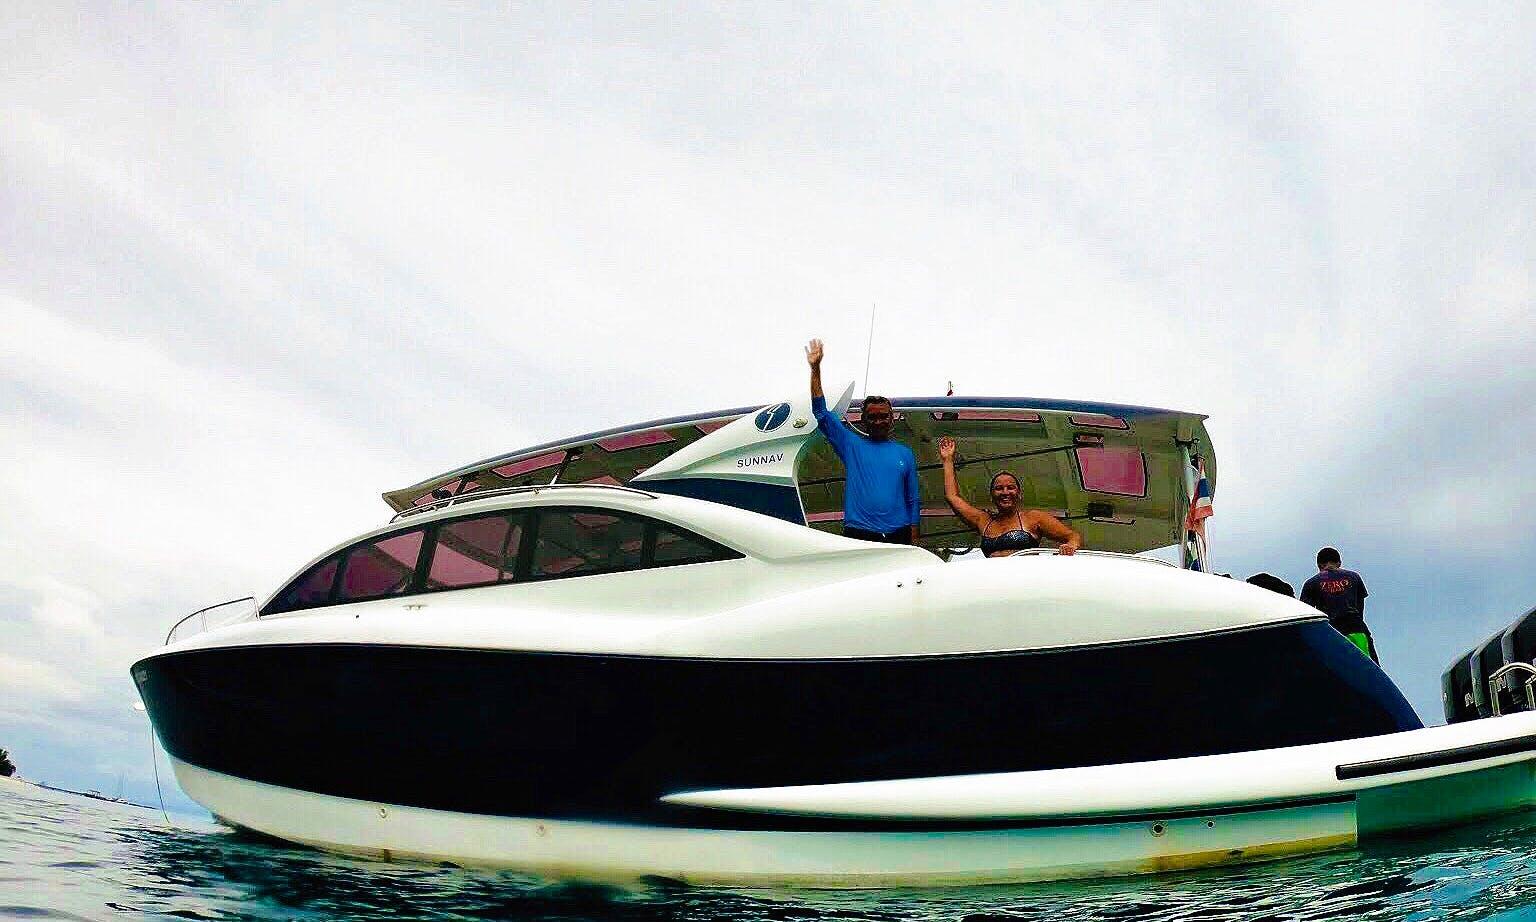 Charter to Dolphin island, Khai, Rang Yai + BBQ